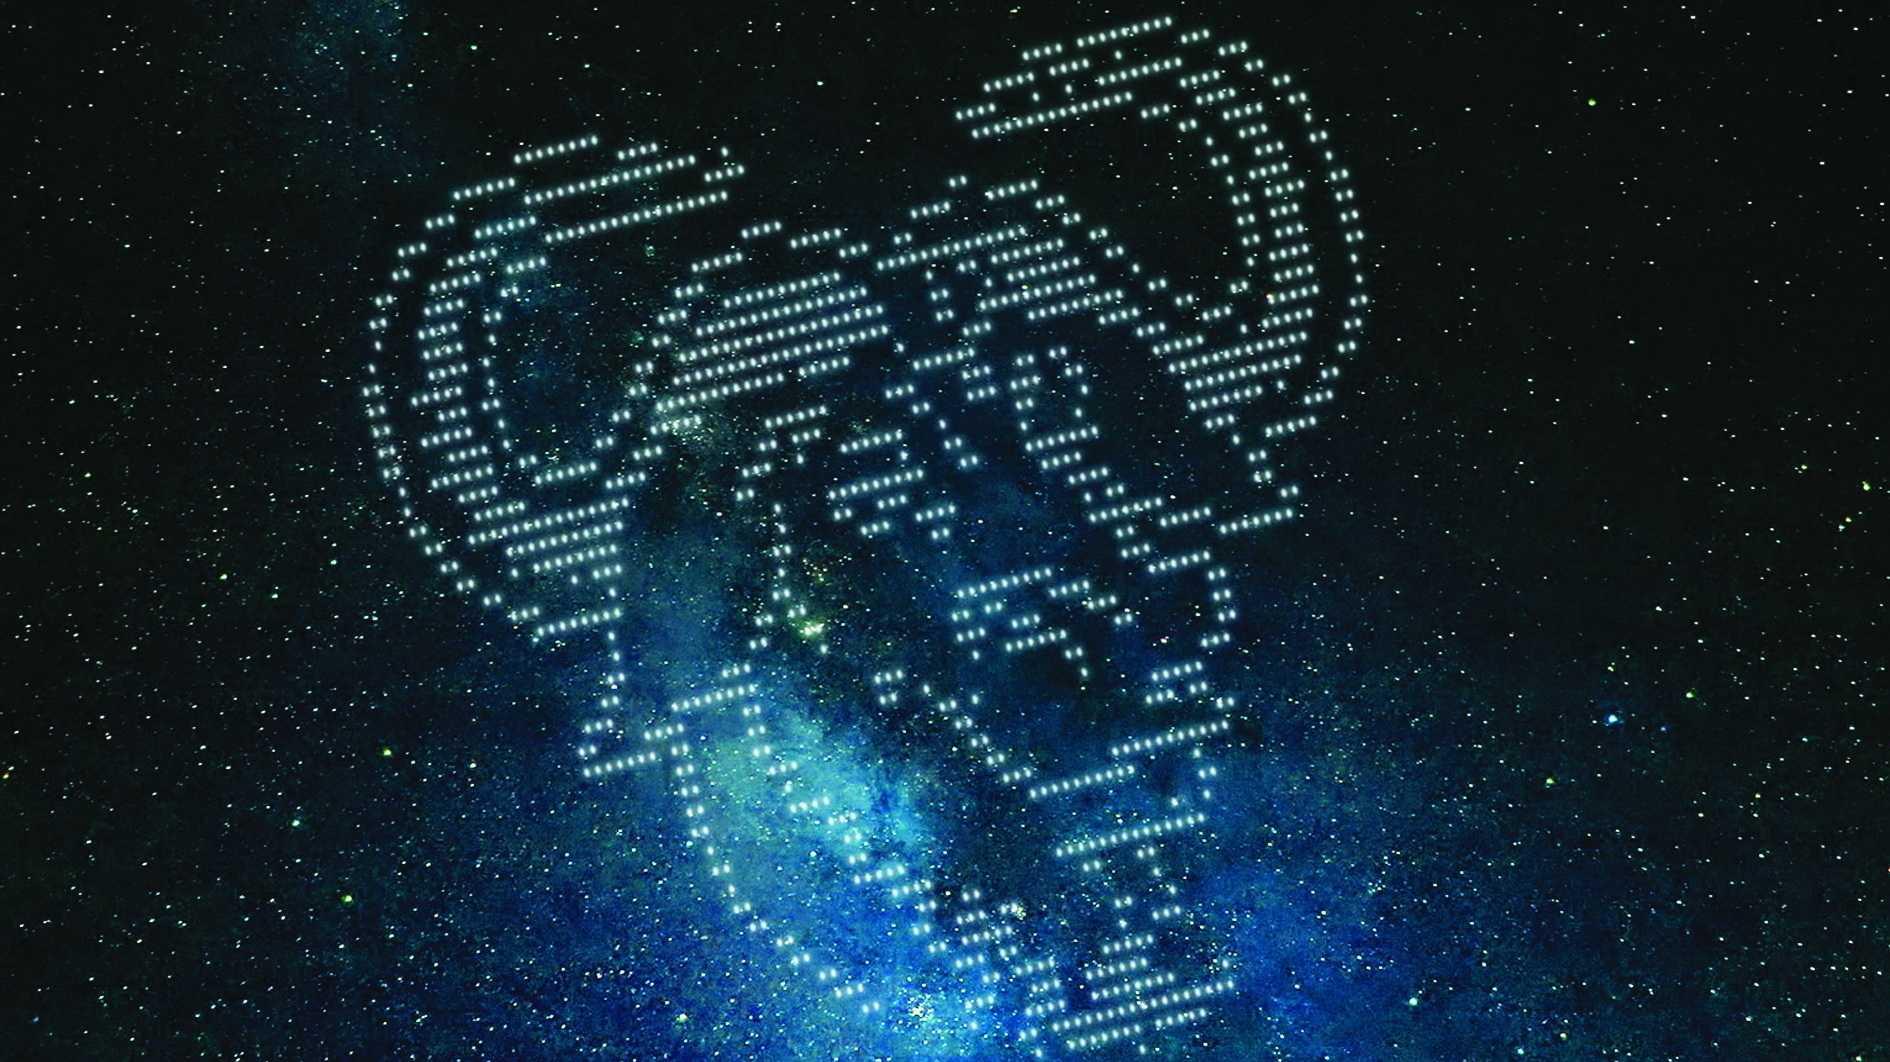 Die Programmiersprache D hat es in die GNU Compiler Collection geschafft